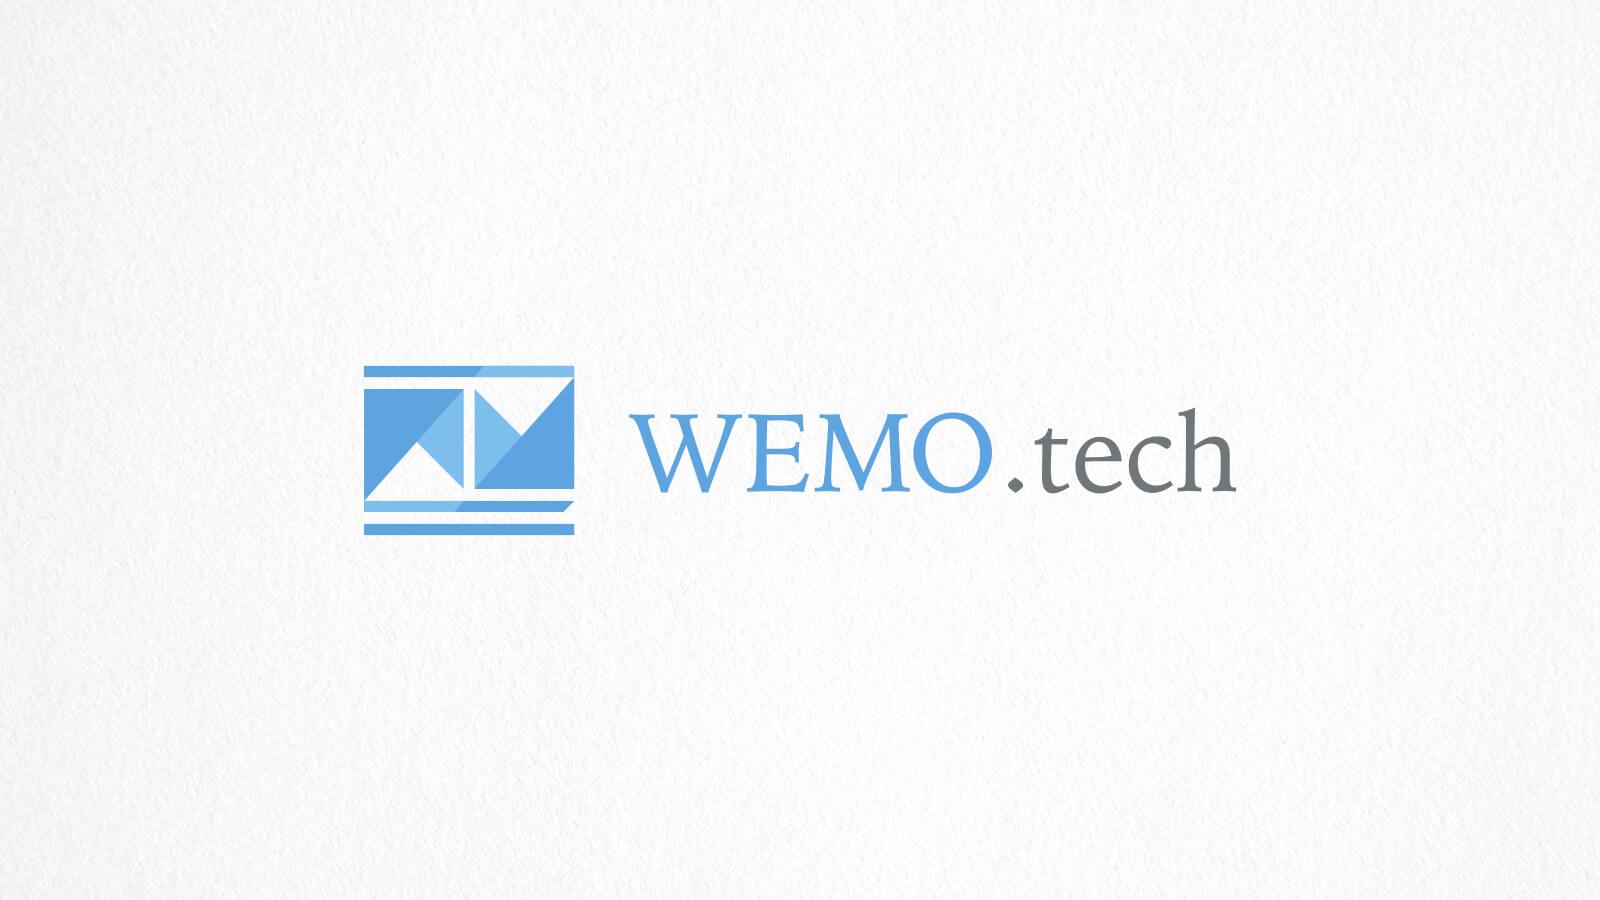 WEMO.tech